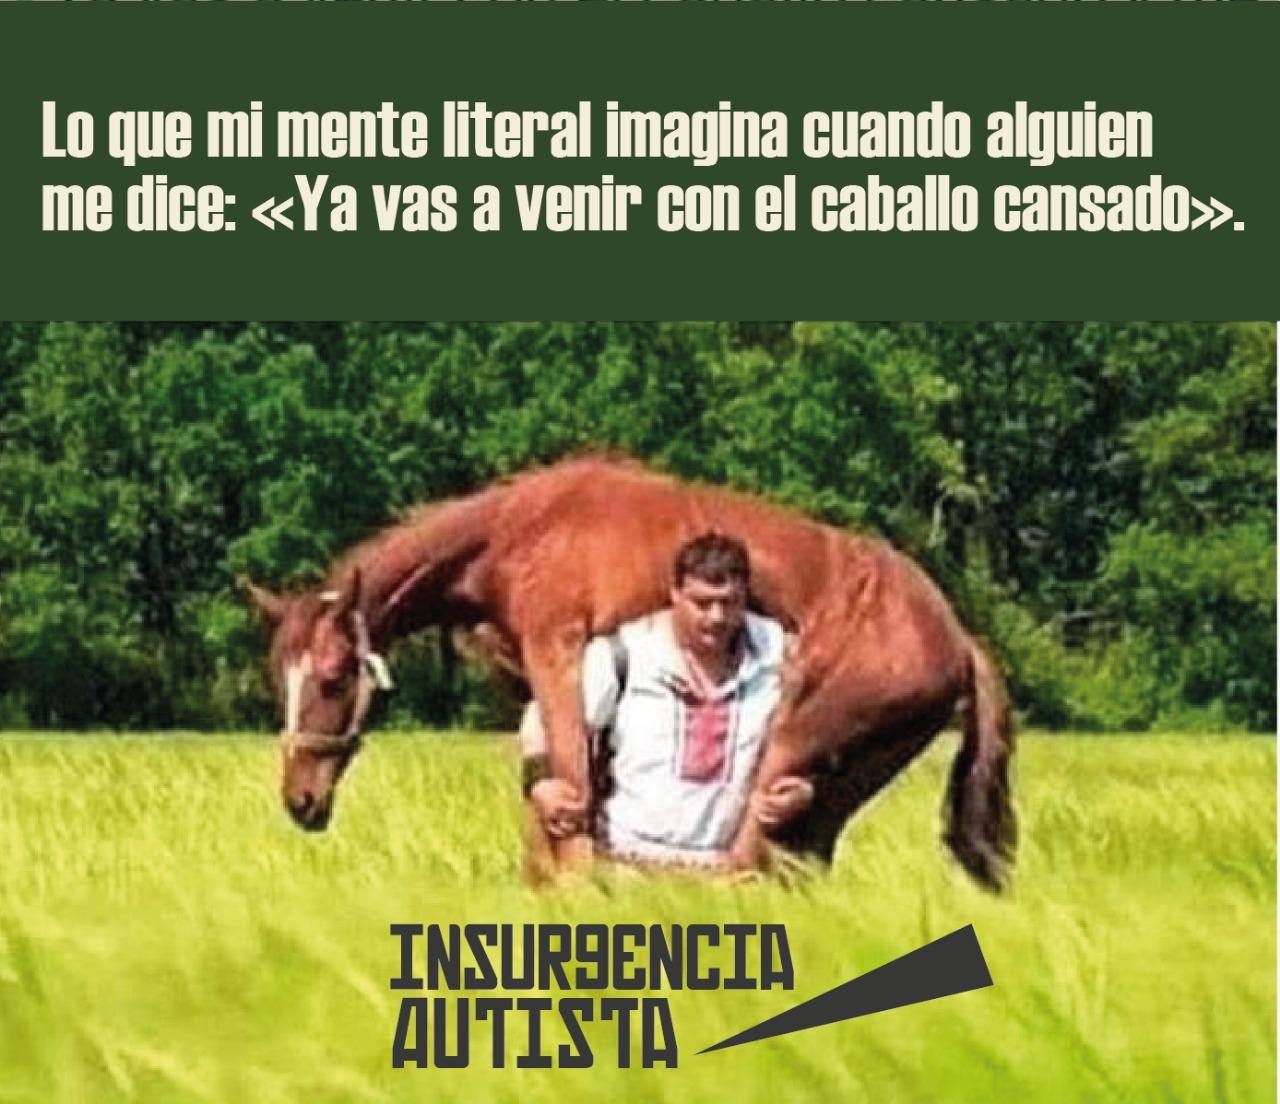 Insurgencia00001